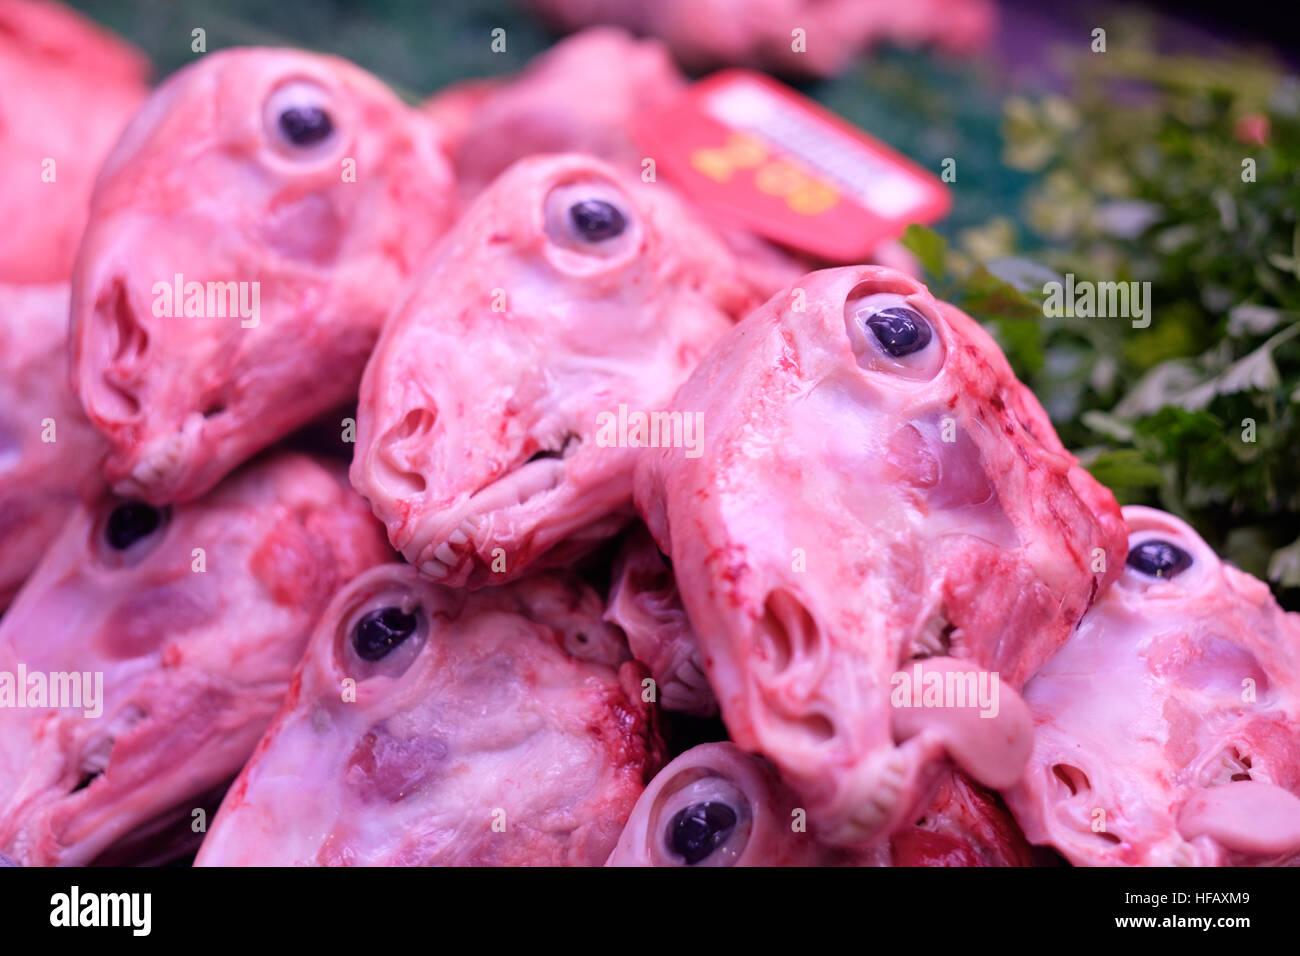 sheep head skinless eyeballs eye tongue butcher - Stock Image